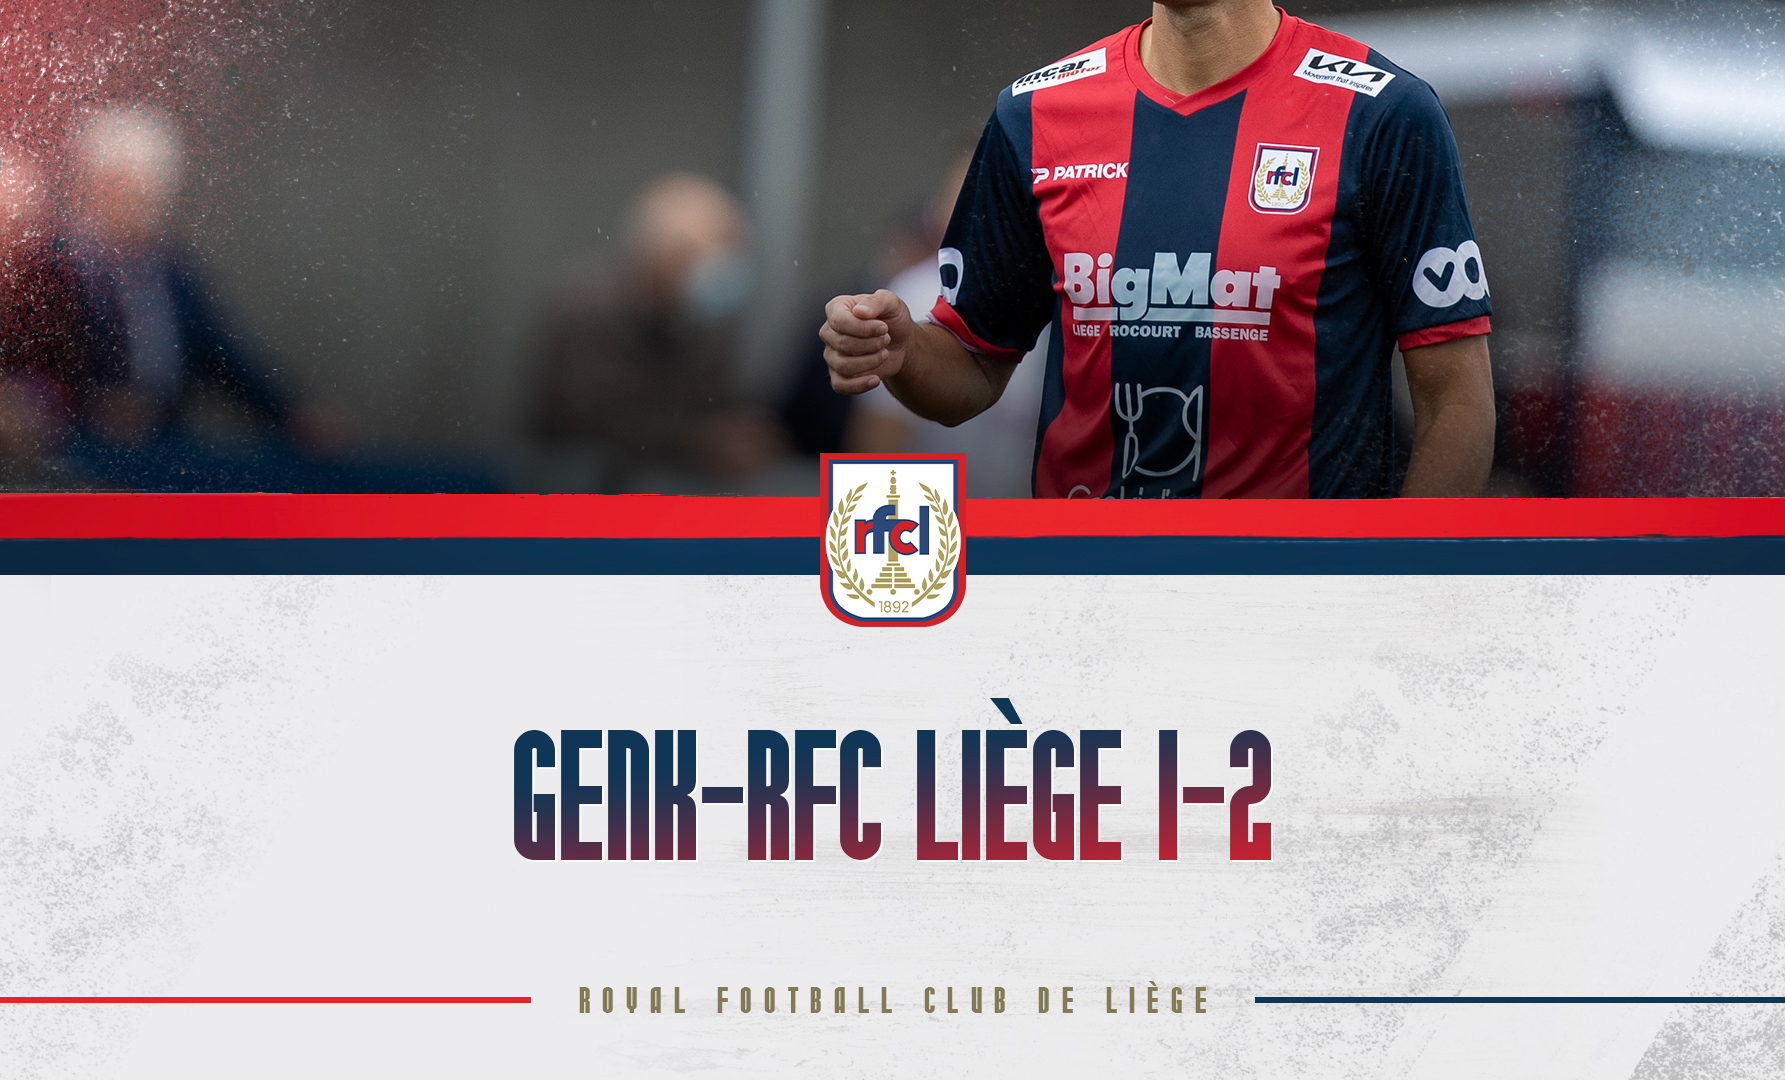 Amical | Genk U21-RFC Liège 1-2